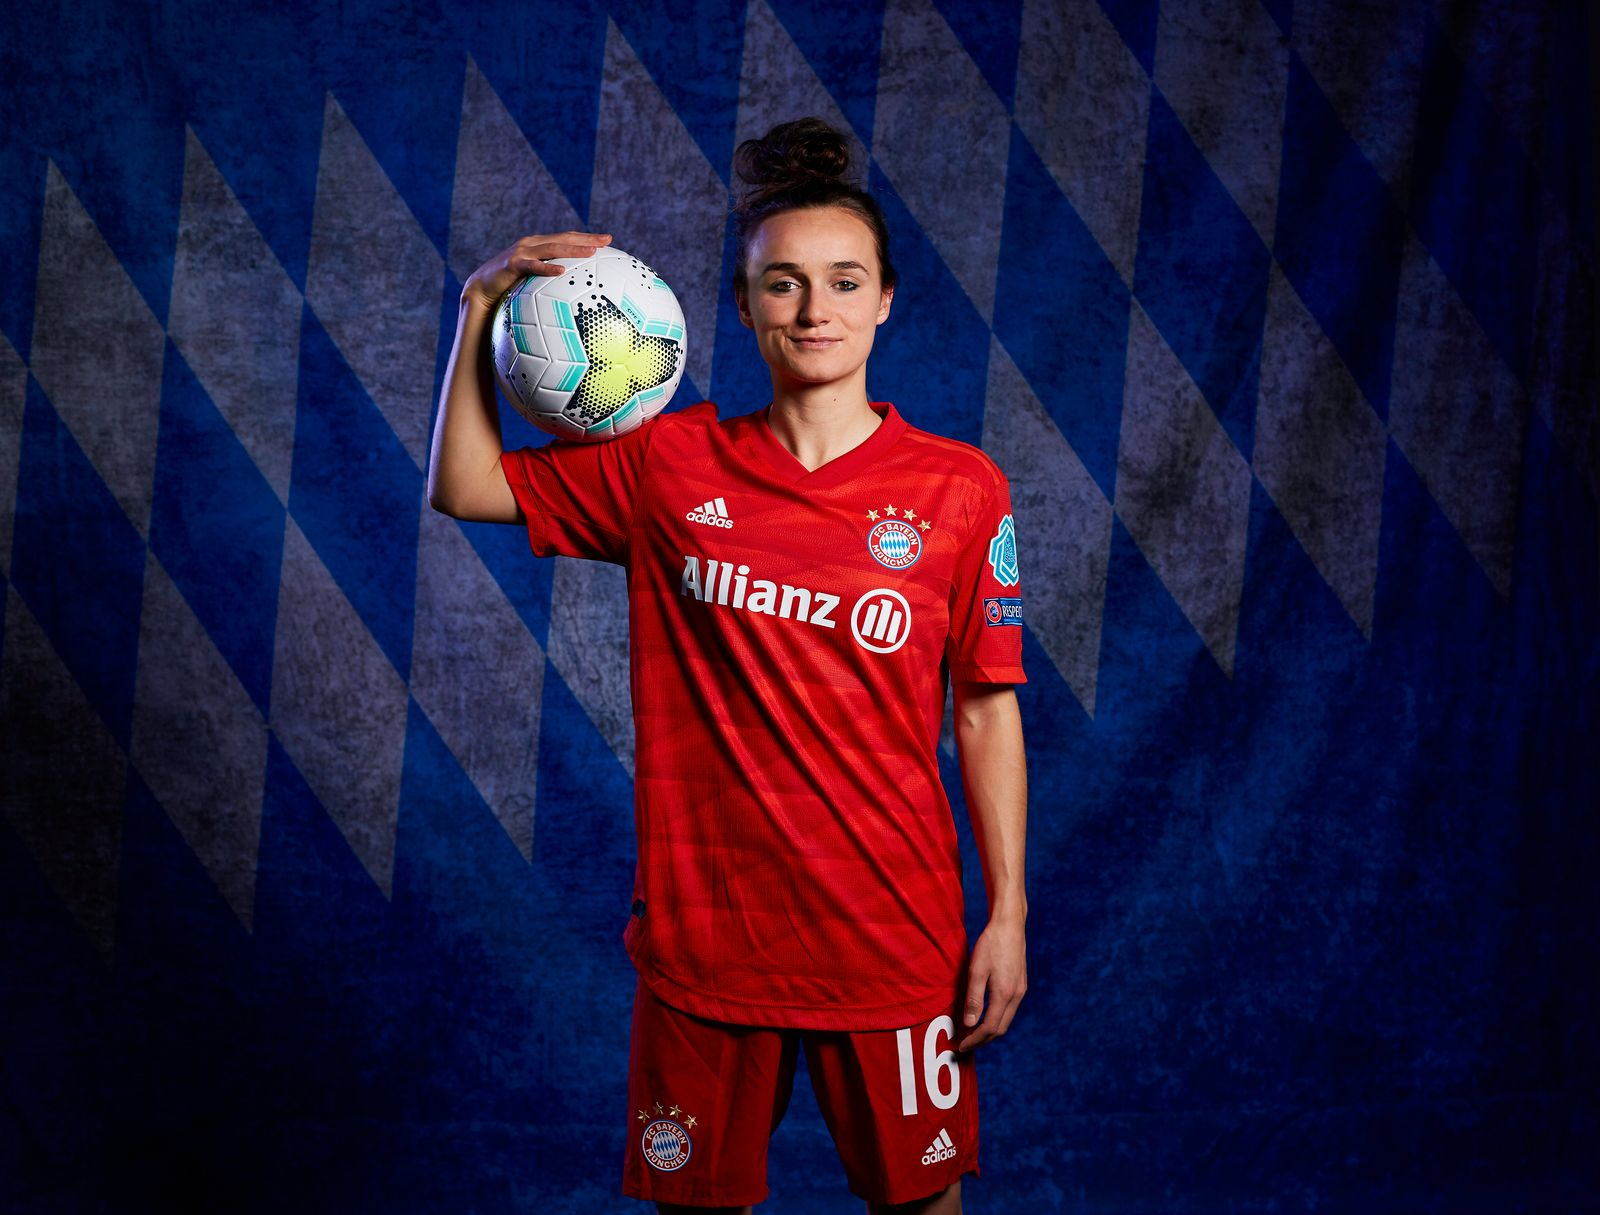 UEFA Women's Champions League Portrait Shoots: Bayern Munich